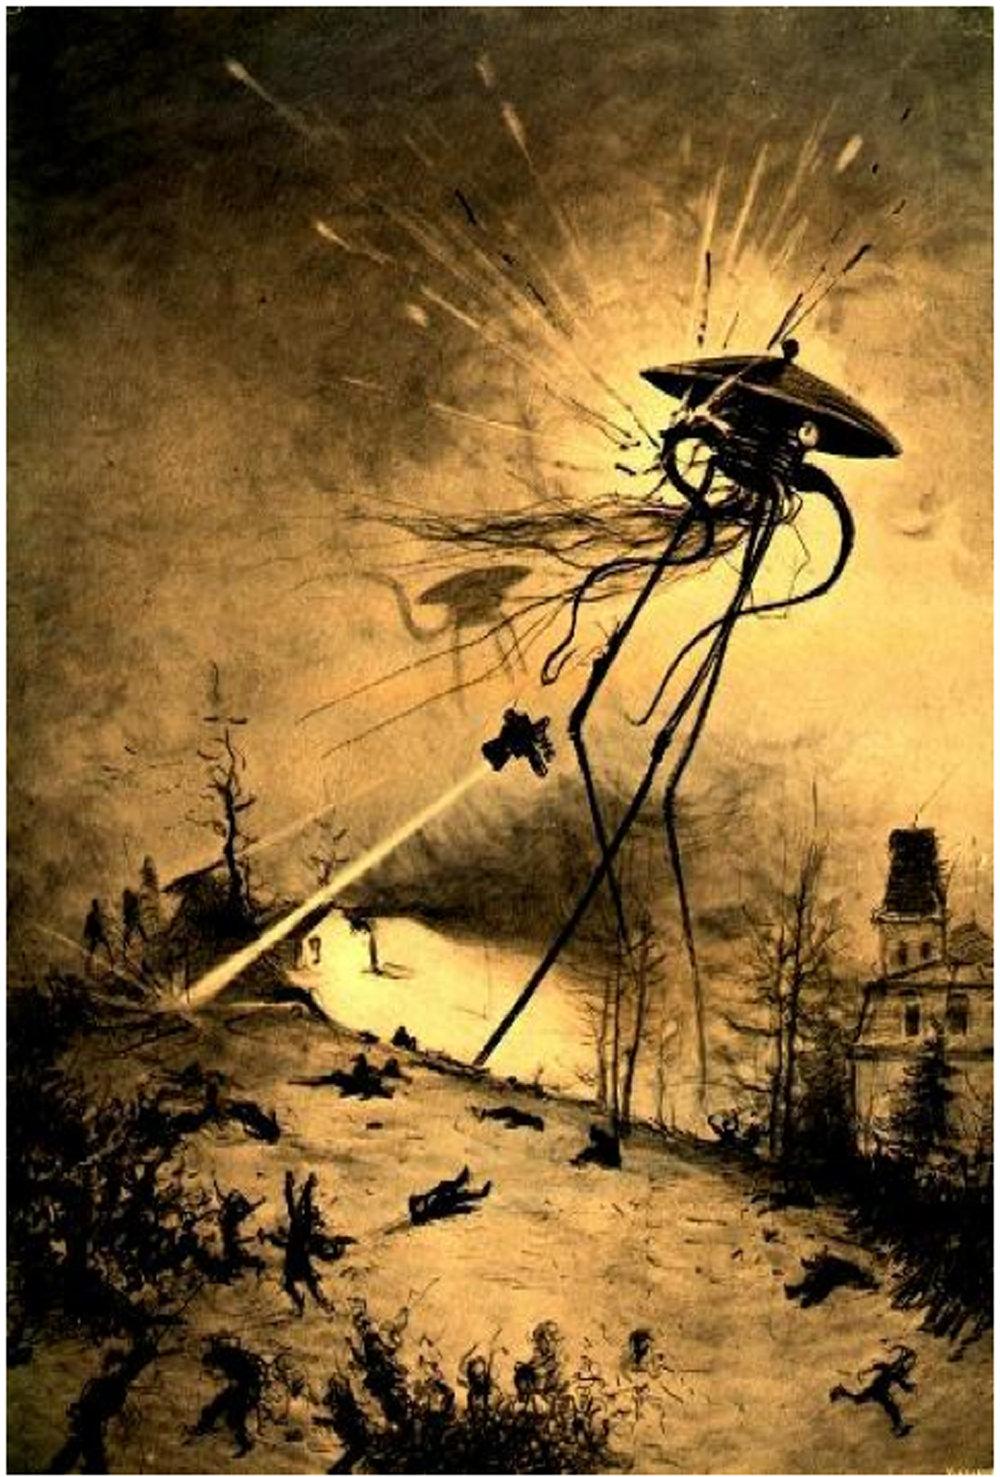 War of the Worlds original illustration.